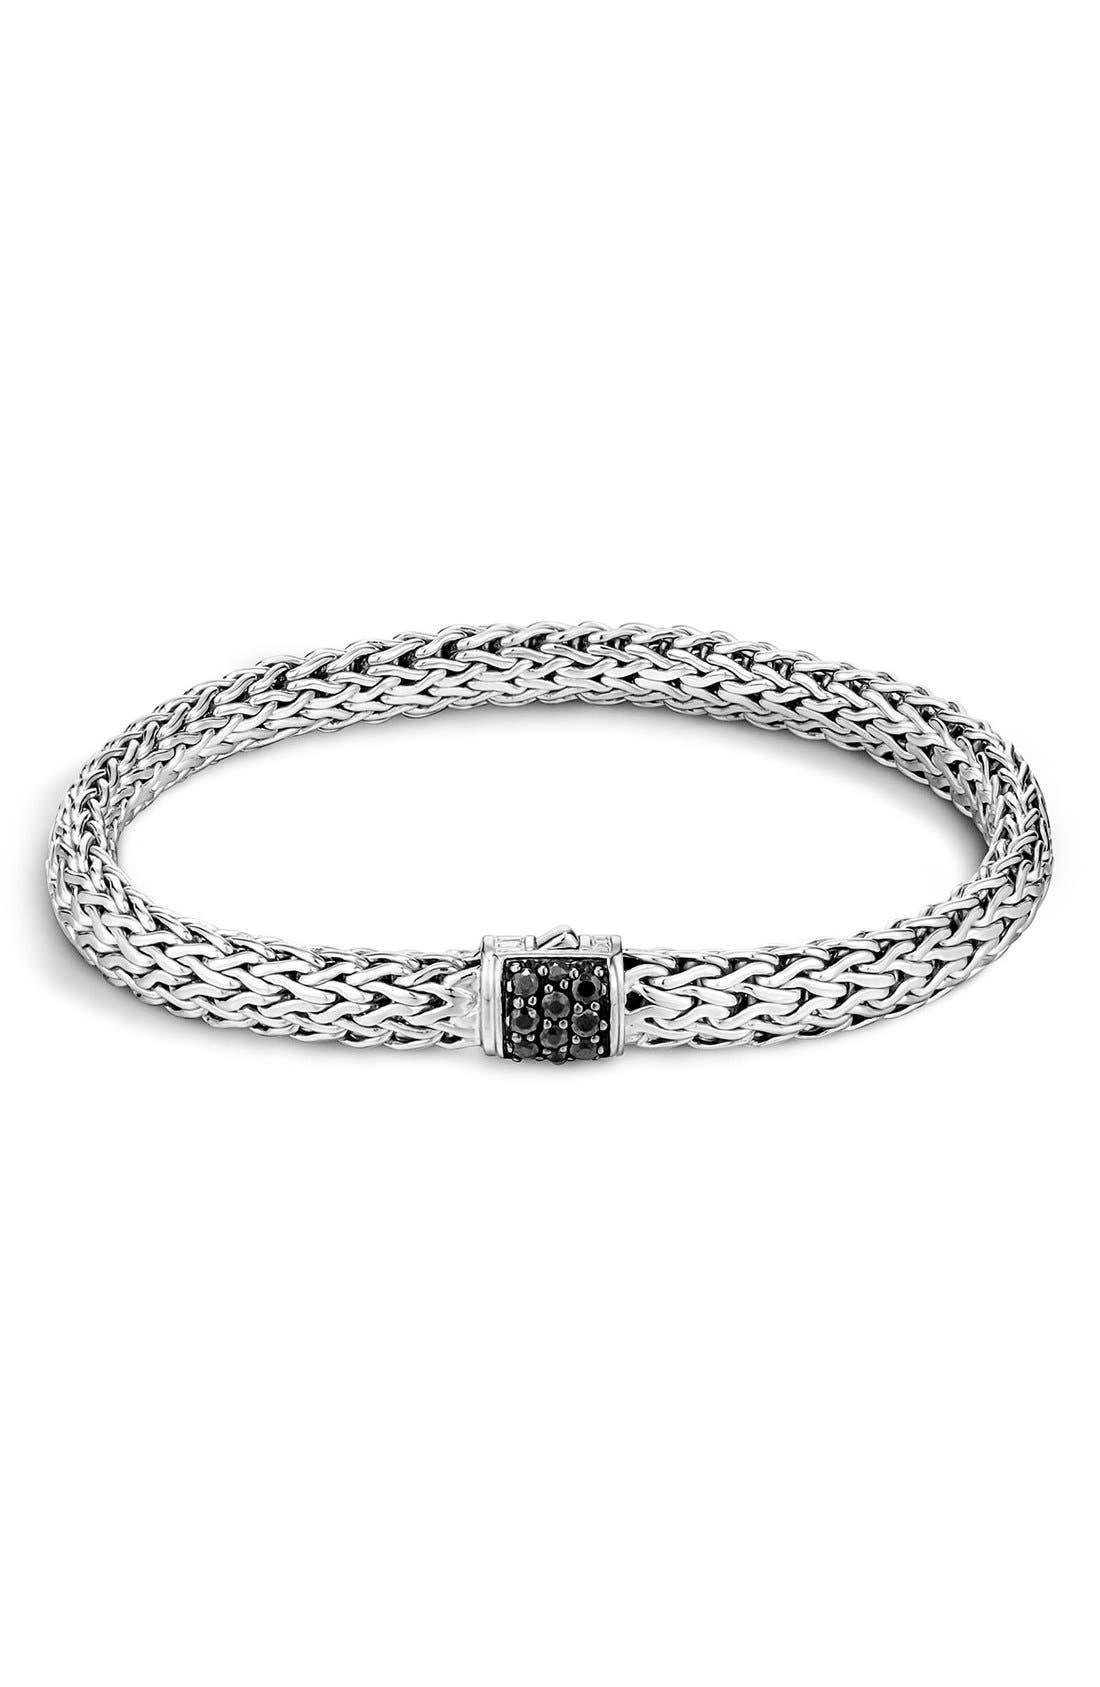 Alternate Image 1 Selected - John Hardy Classic Chain 6.5mm Bracelet